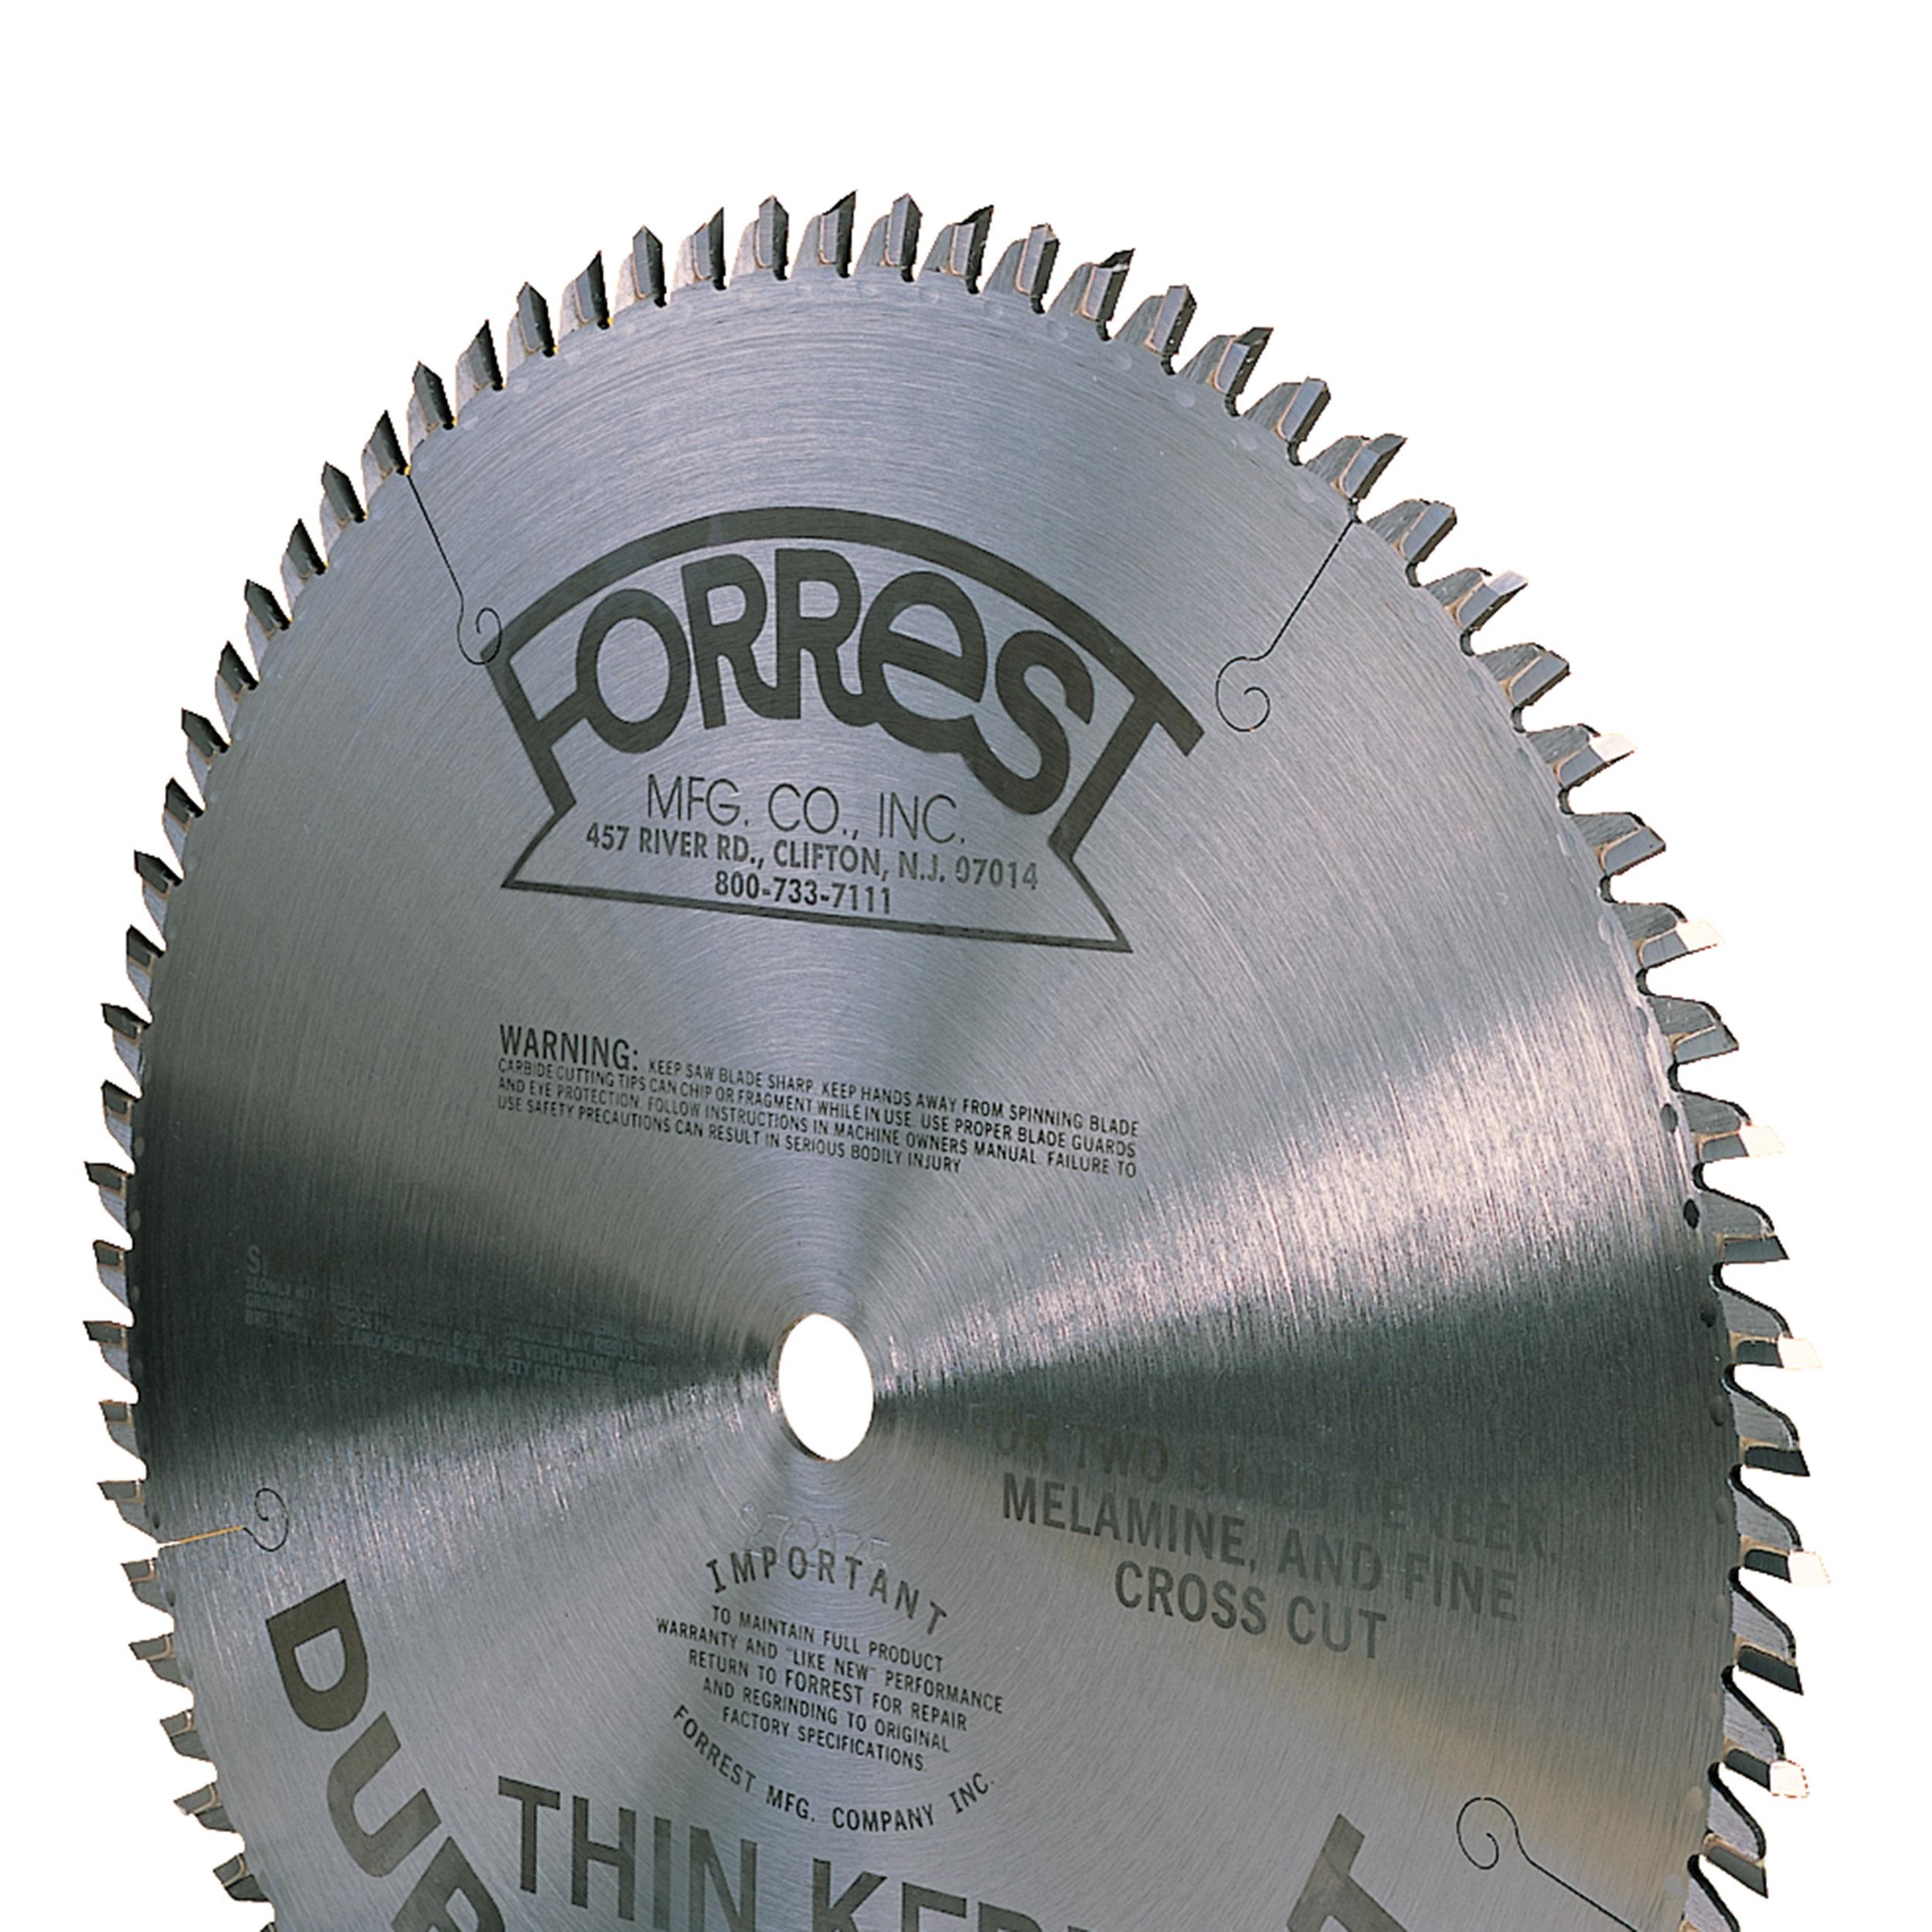 Forrest DH10807100 Duraline Hi-A/T Saw Blade, Thin-Kerf, 10